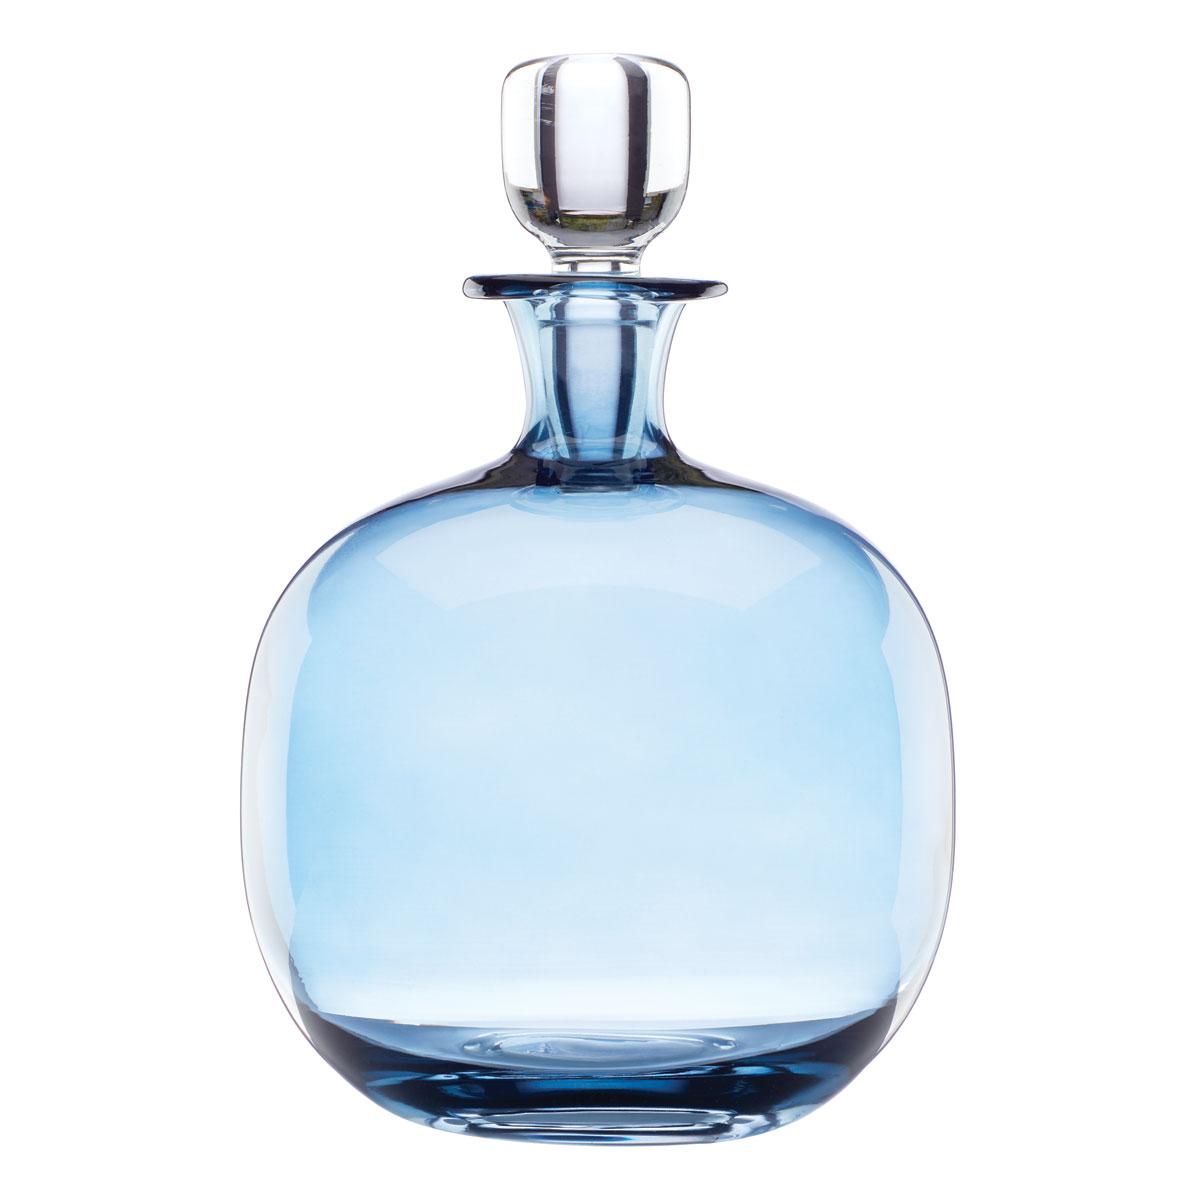 Lenox Valencia Blue Decanter